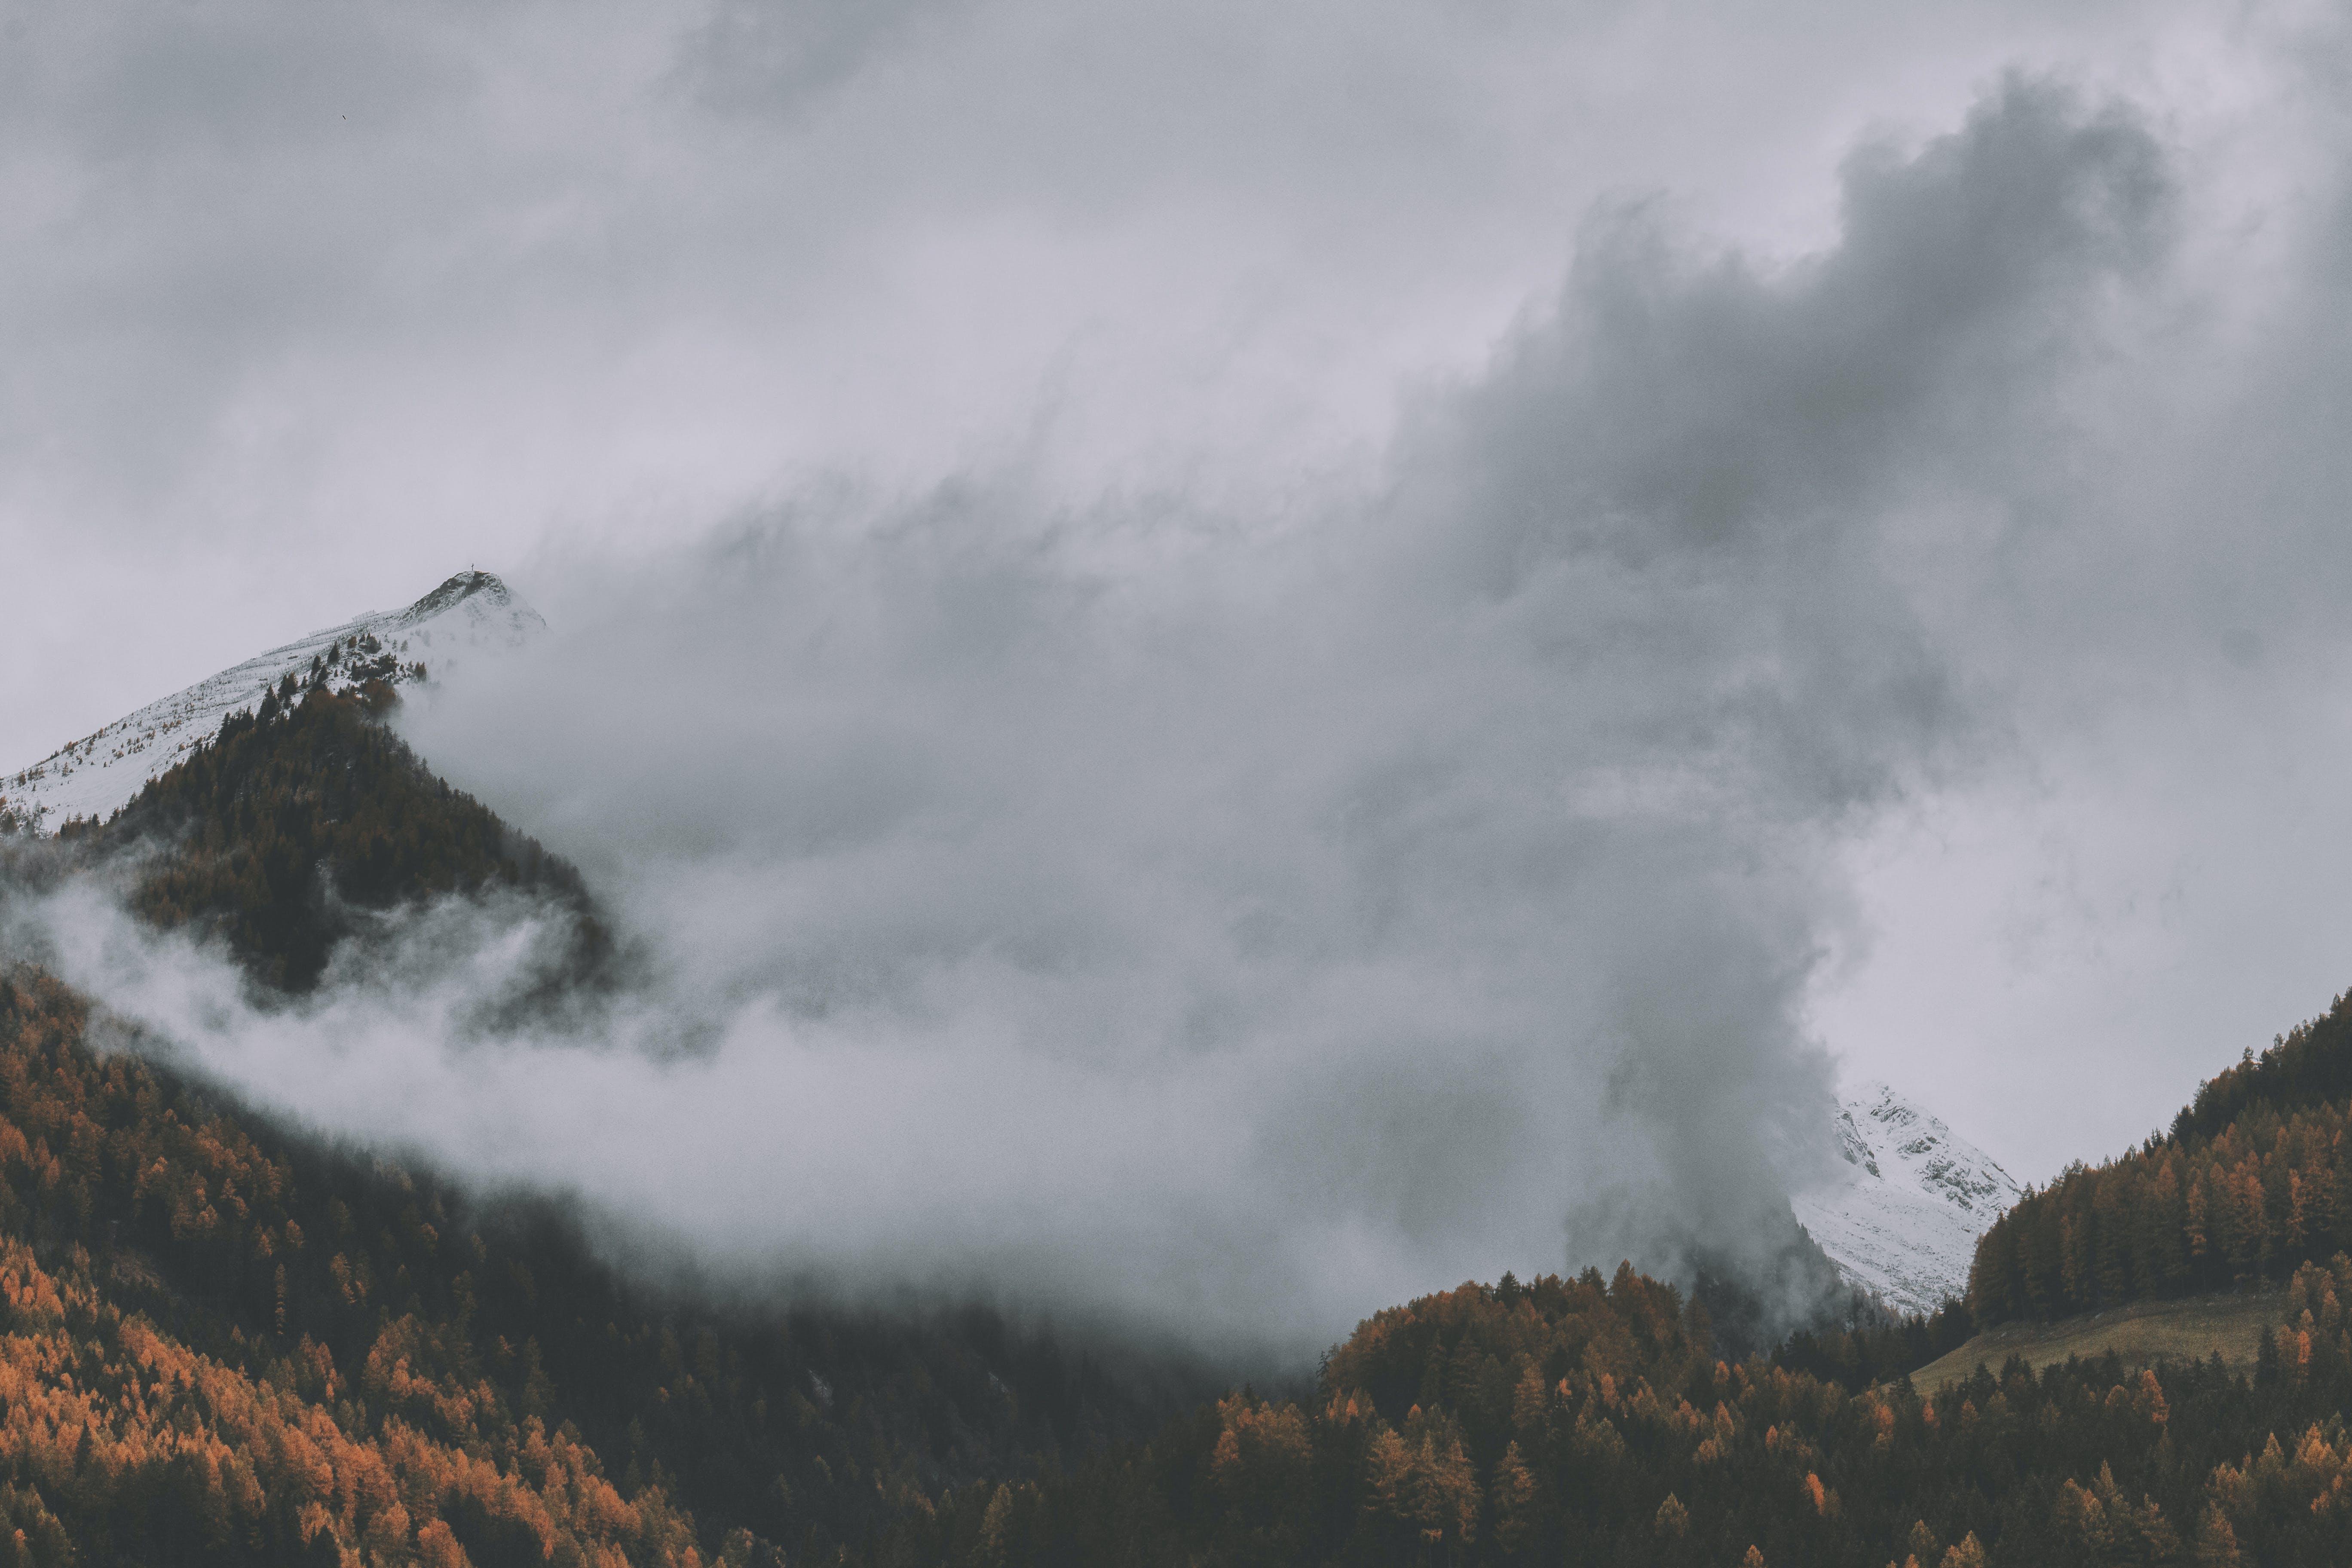 Kostenloses Stock Foto zu bäume, berg, bewölkt, draußen